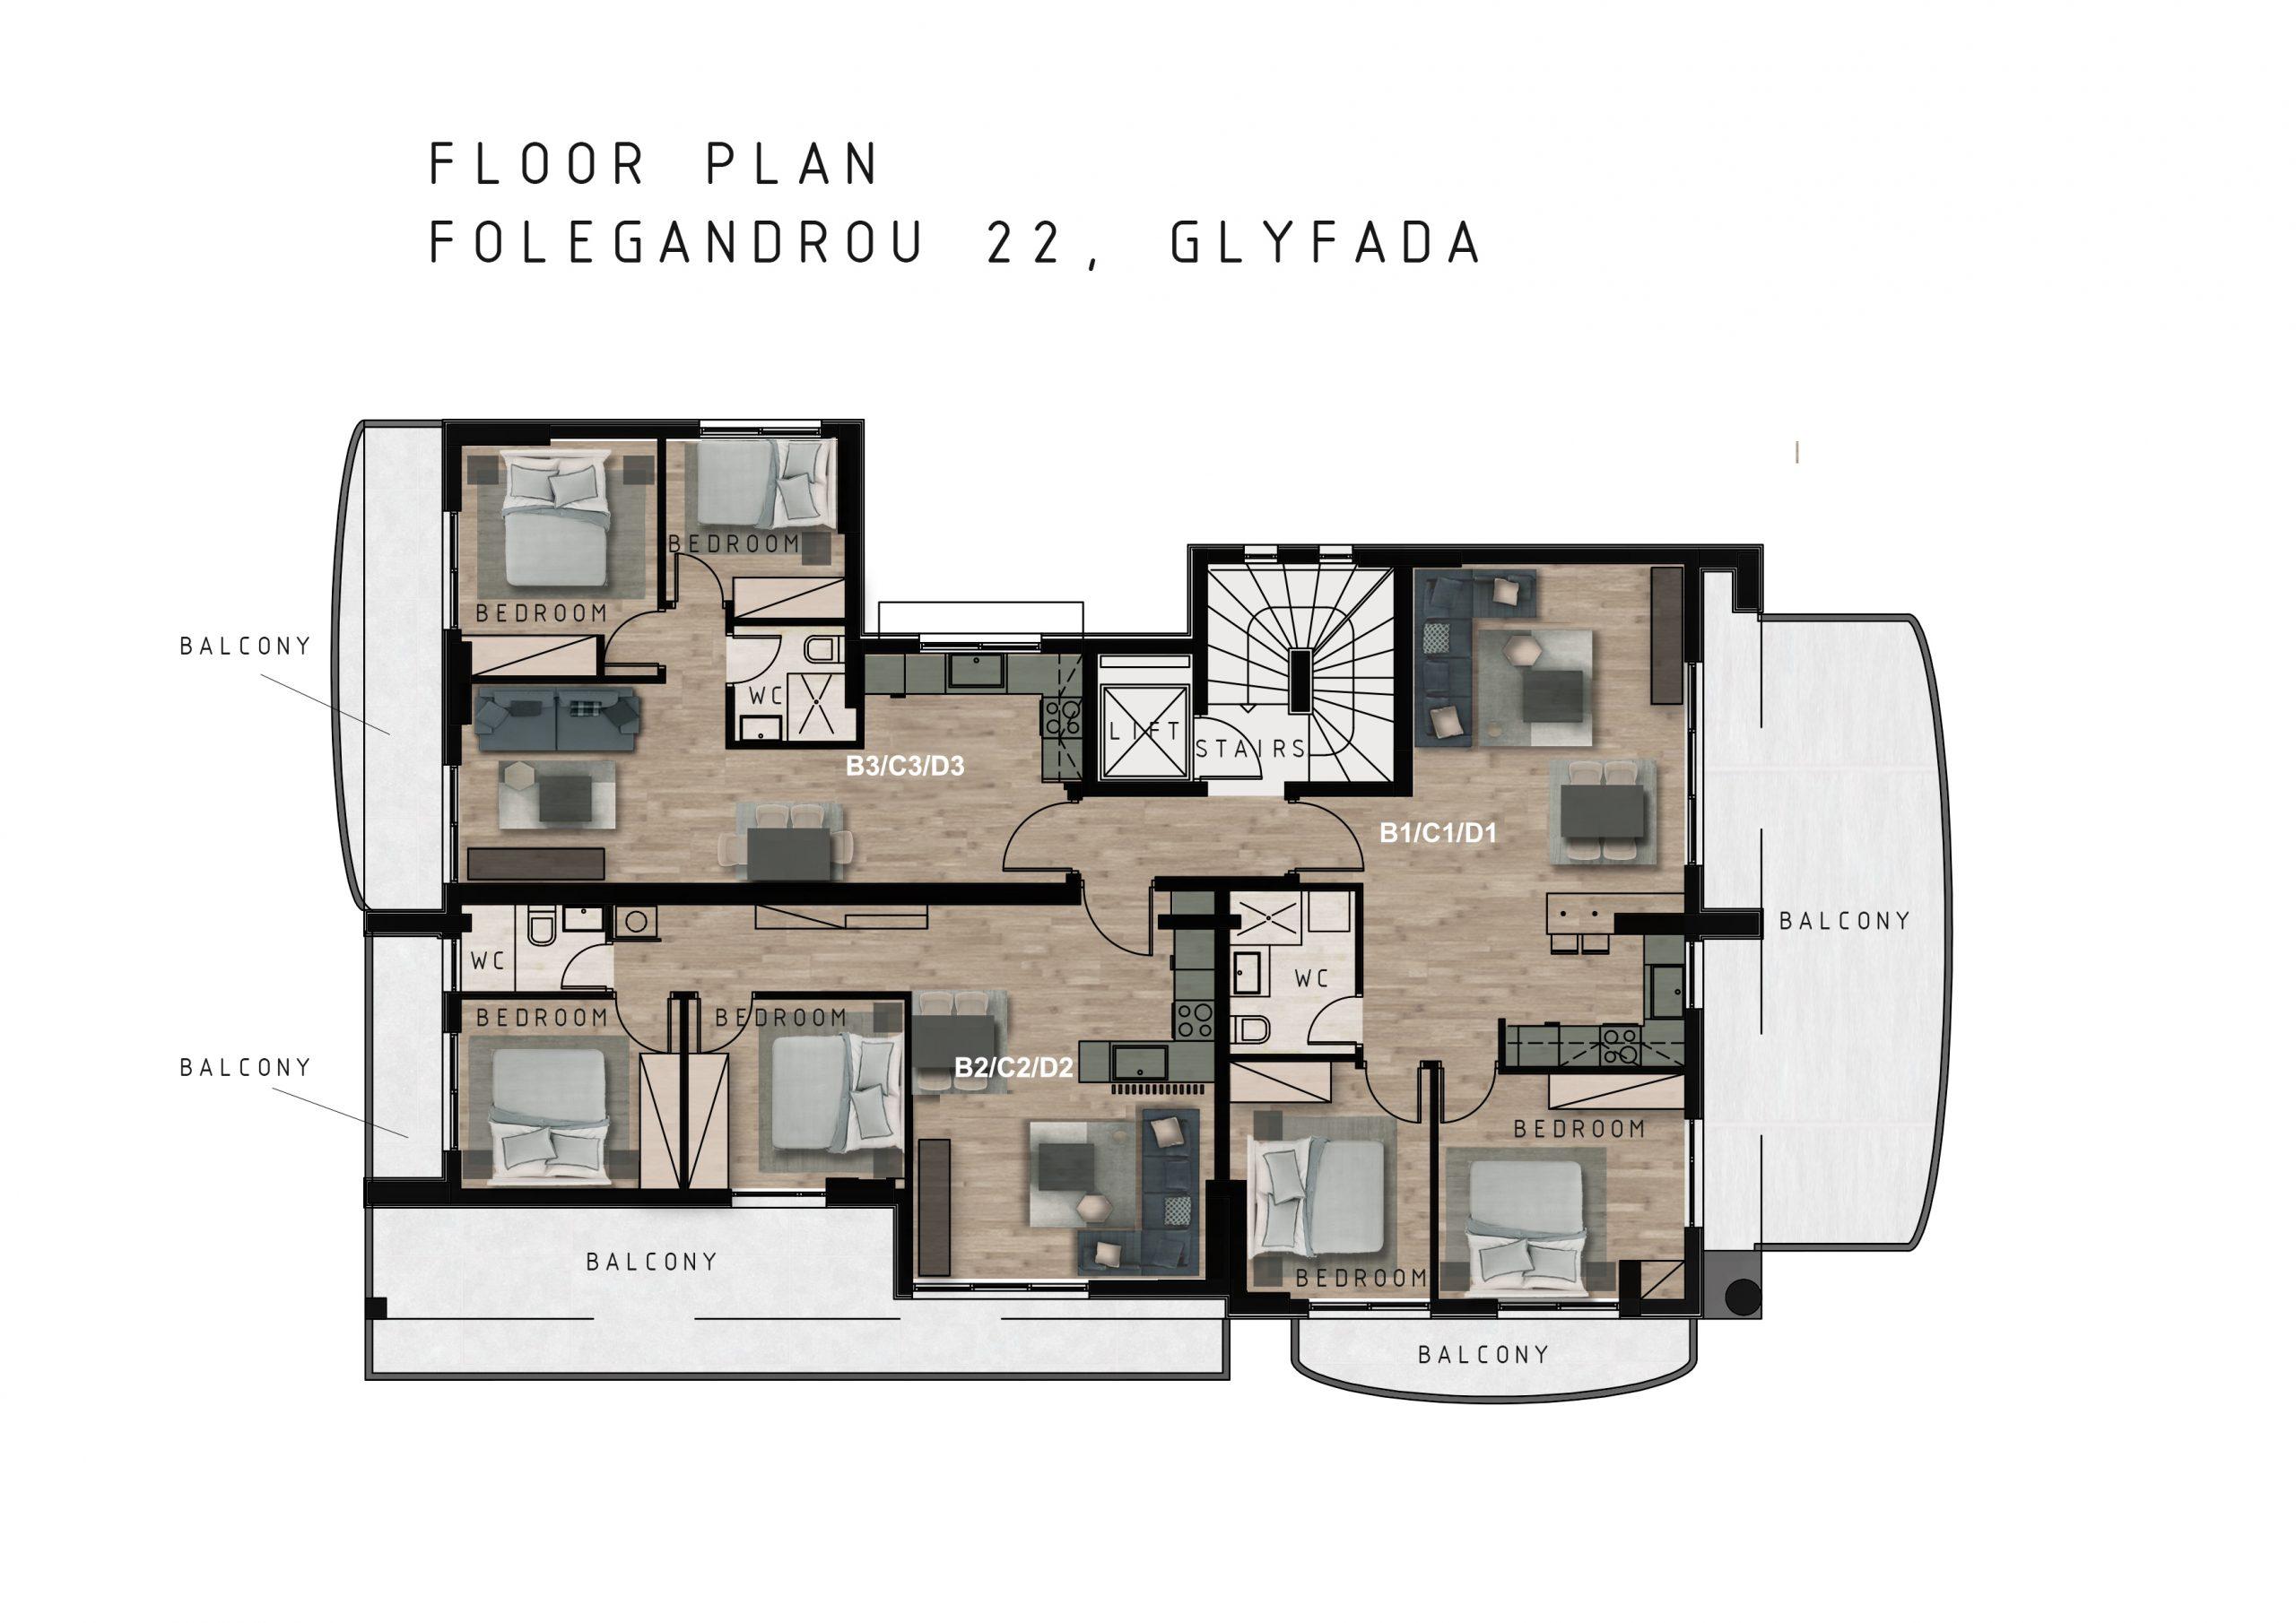 Folegandrou 22